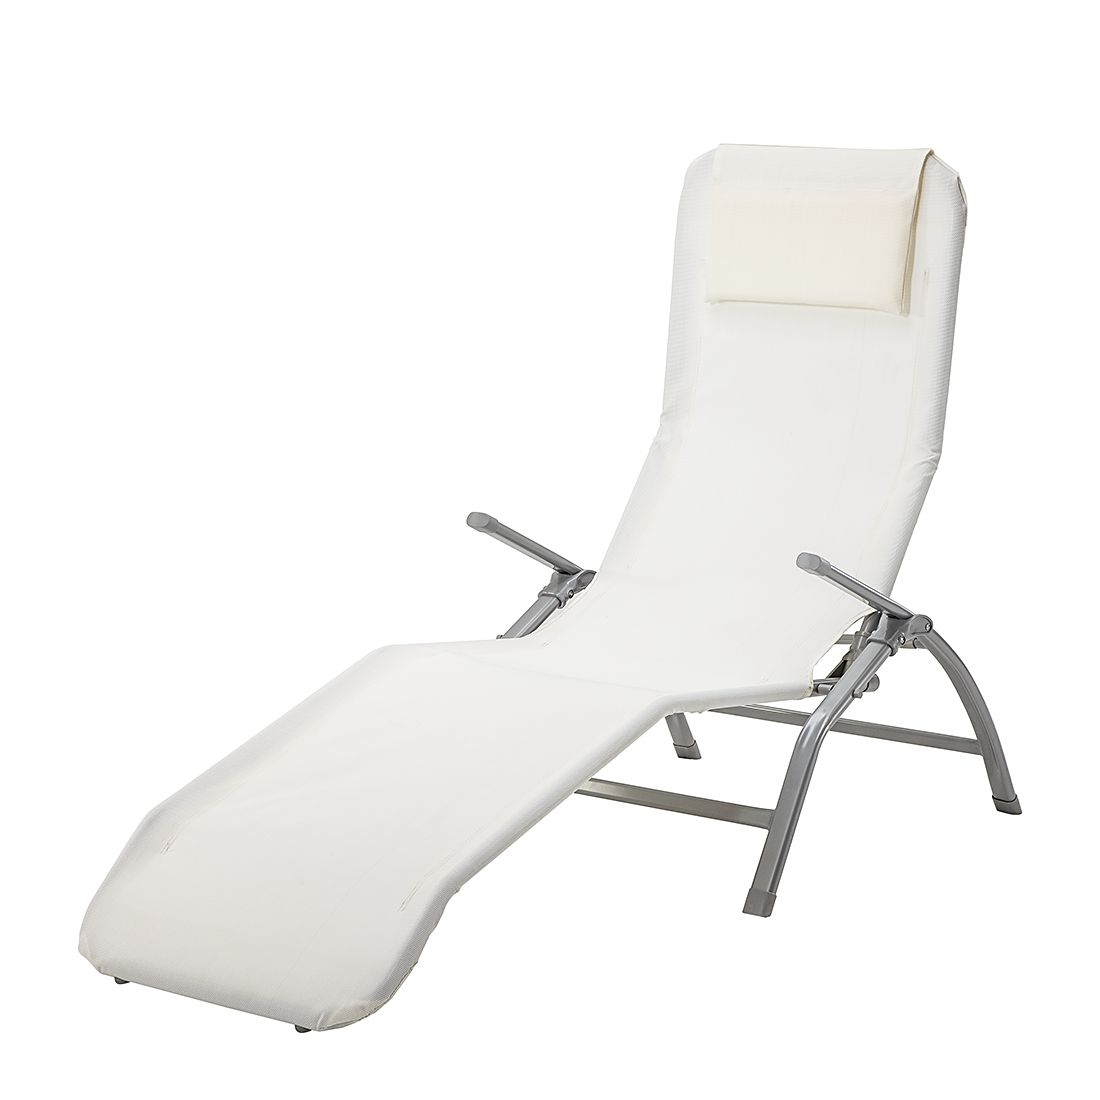 Kippliege Summer Sun - Kunstfasergewebe/Stahl - Weiß/Silber, mooved